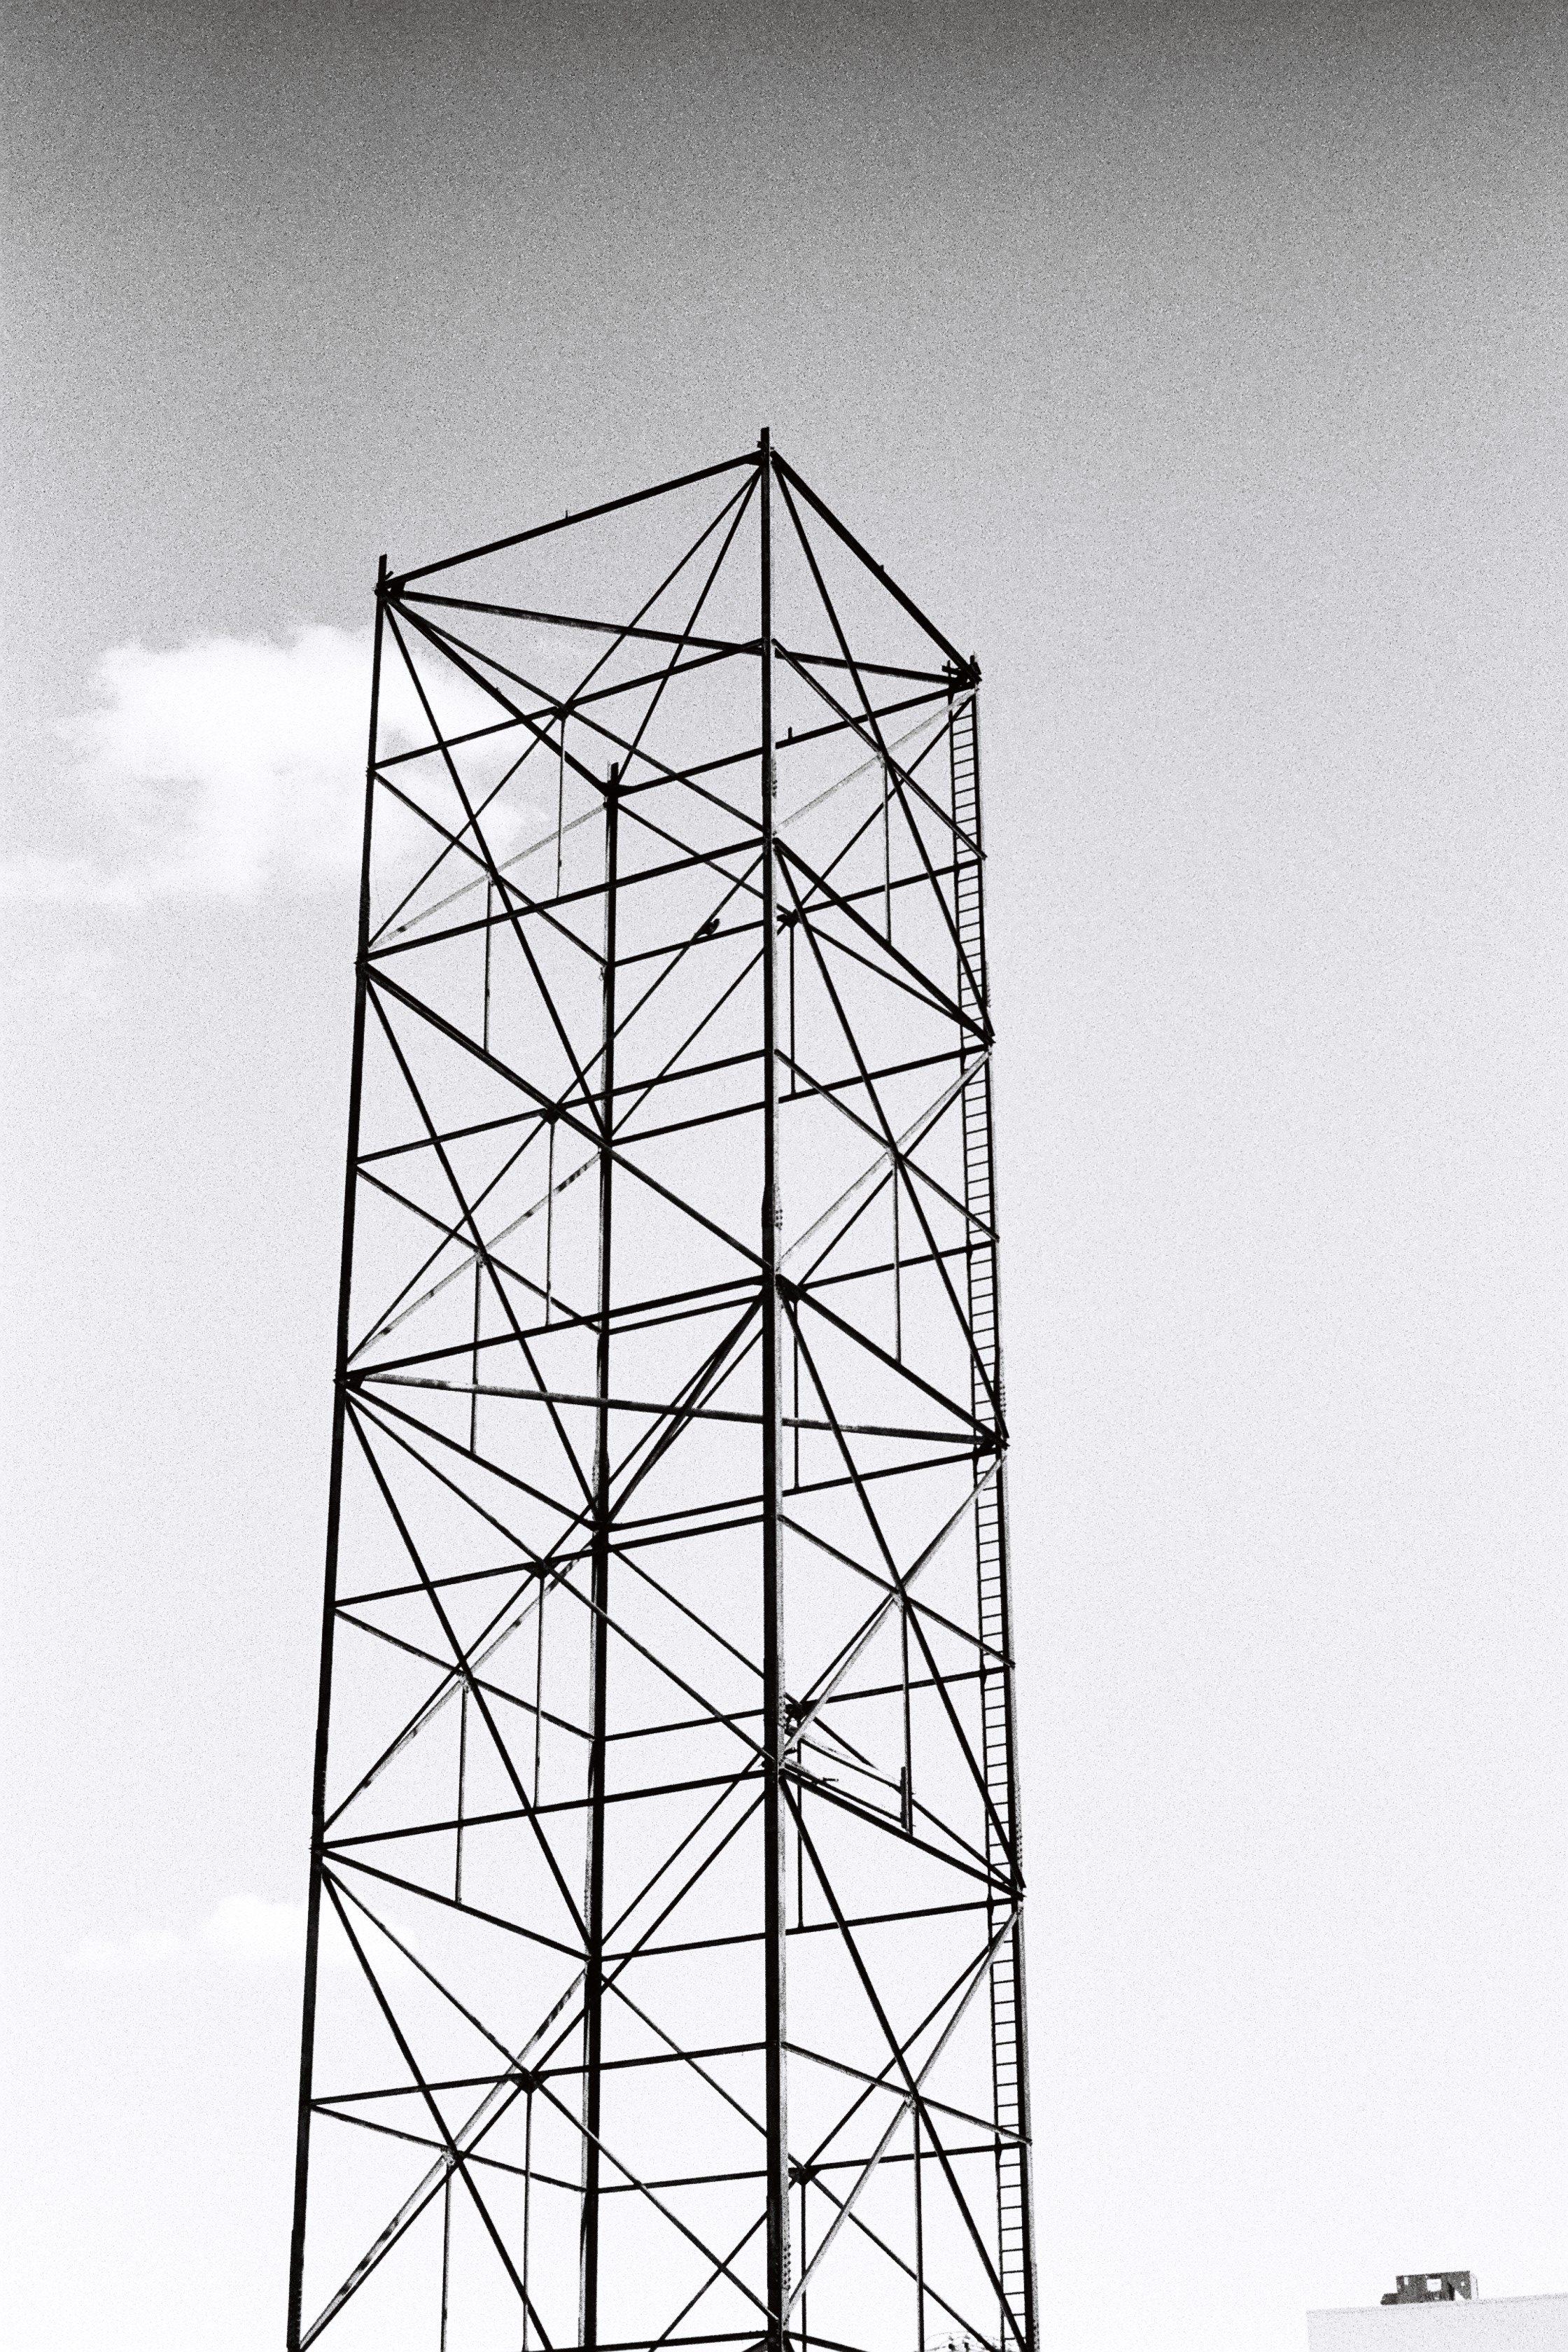 3E PRIX: © Ronan Le Floch